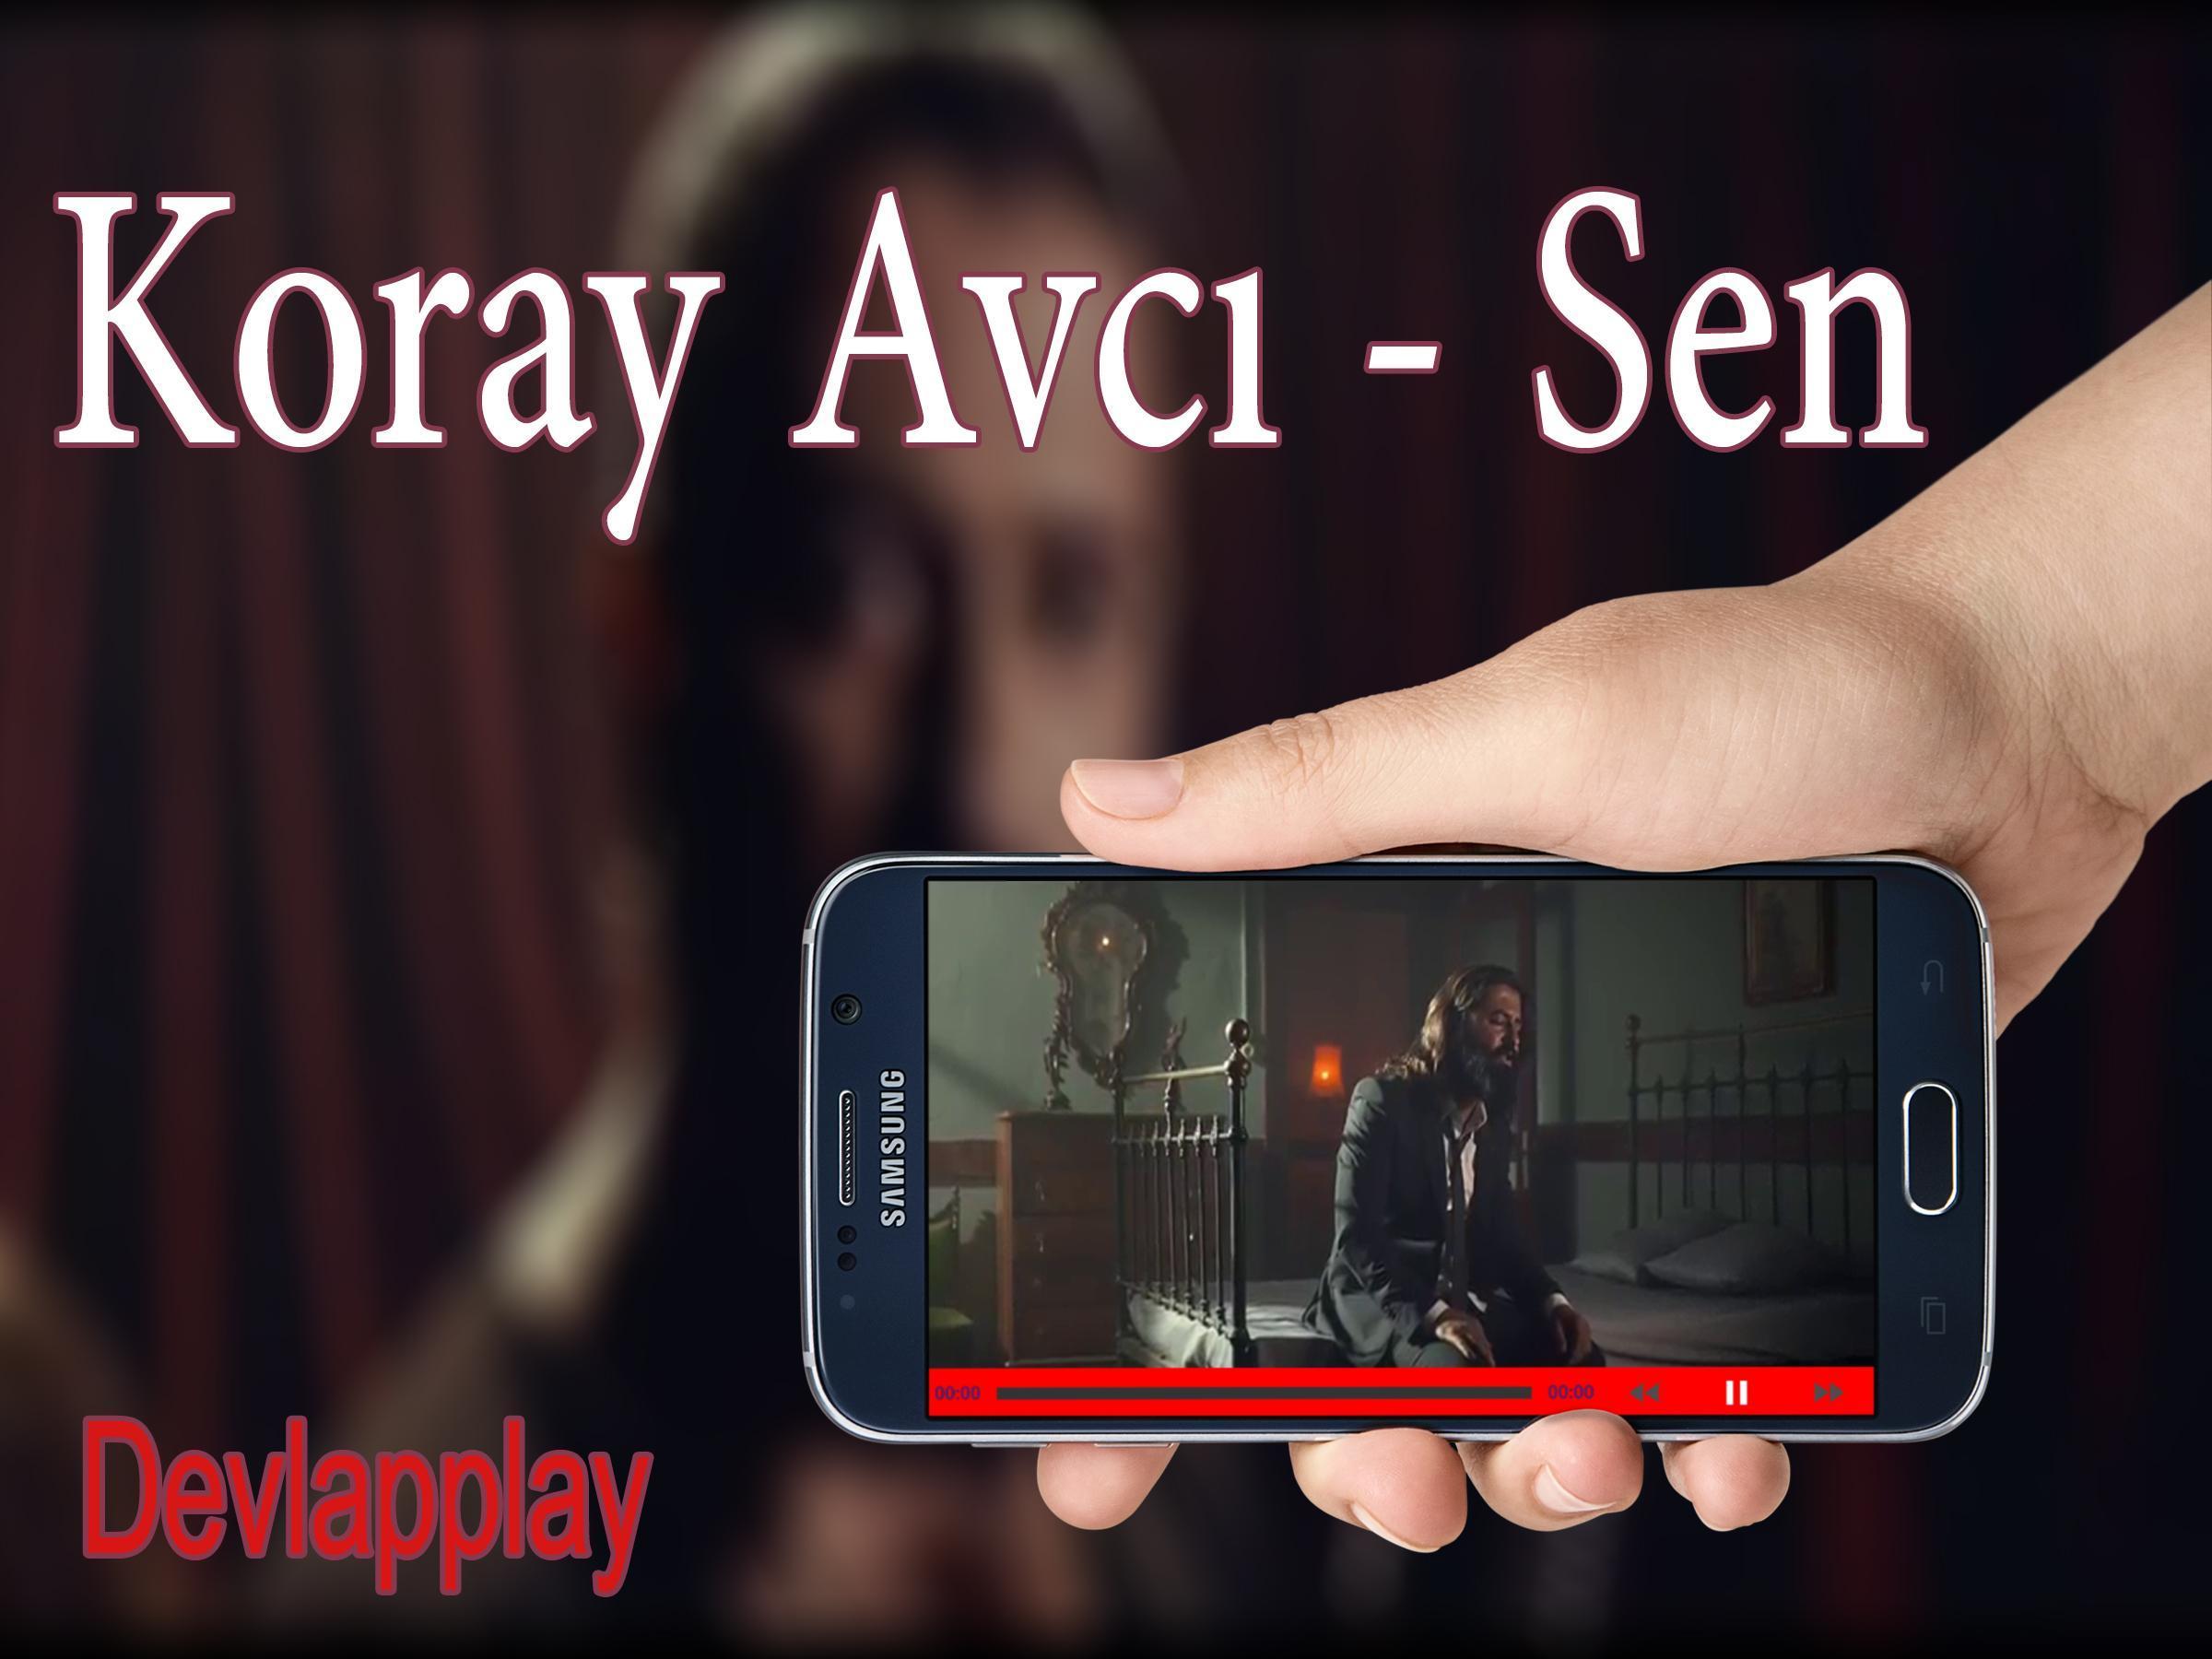 Koray Avcı - Sen for Android - APK Download